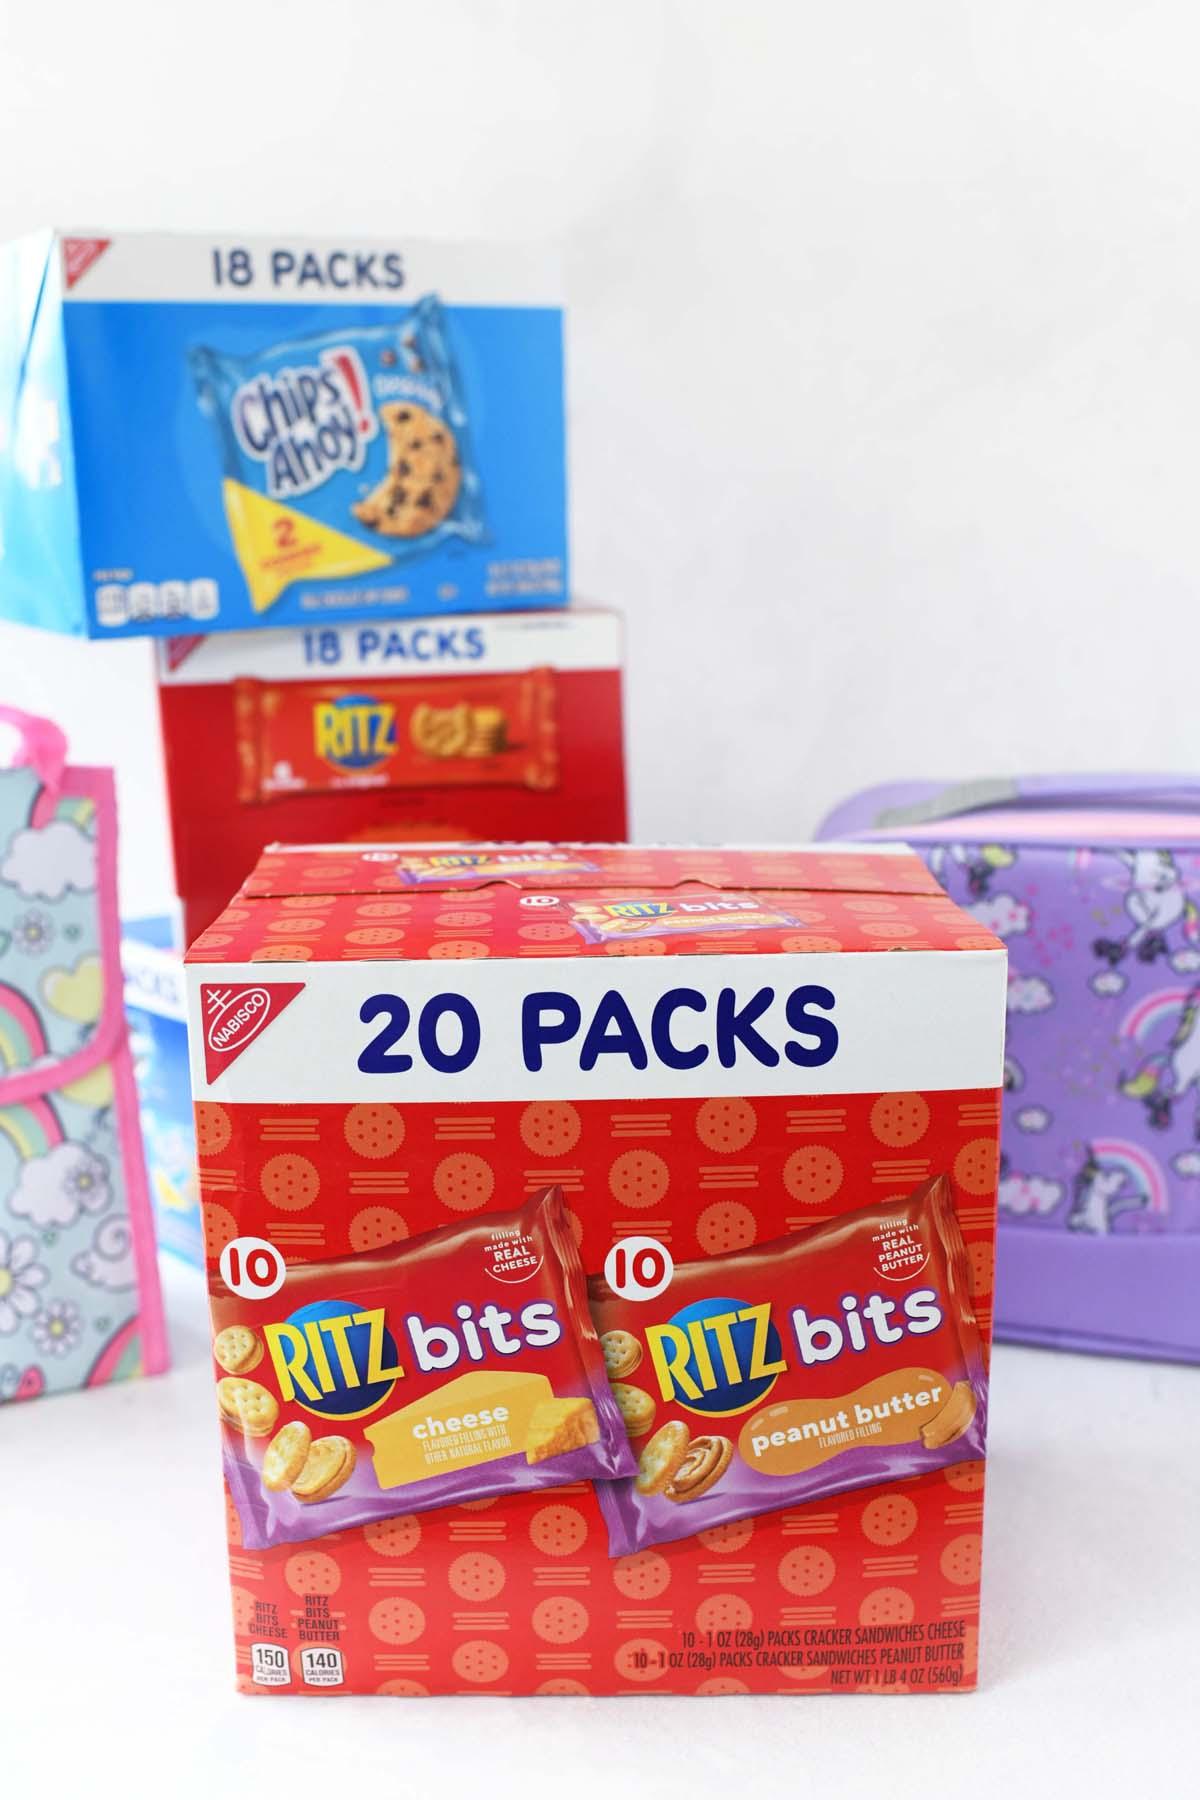 Ritz Bitz multipacks box on a white table.